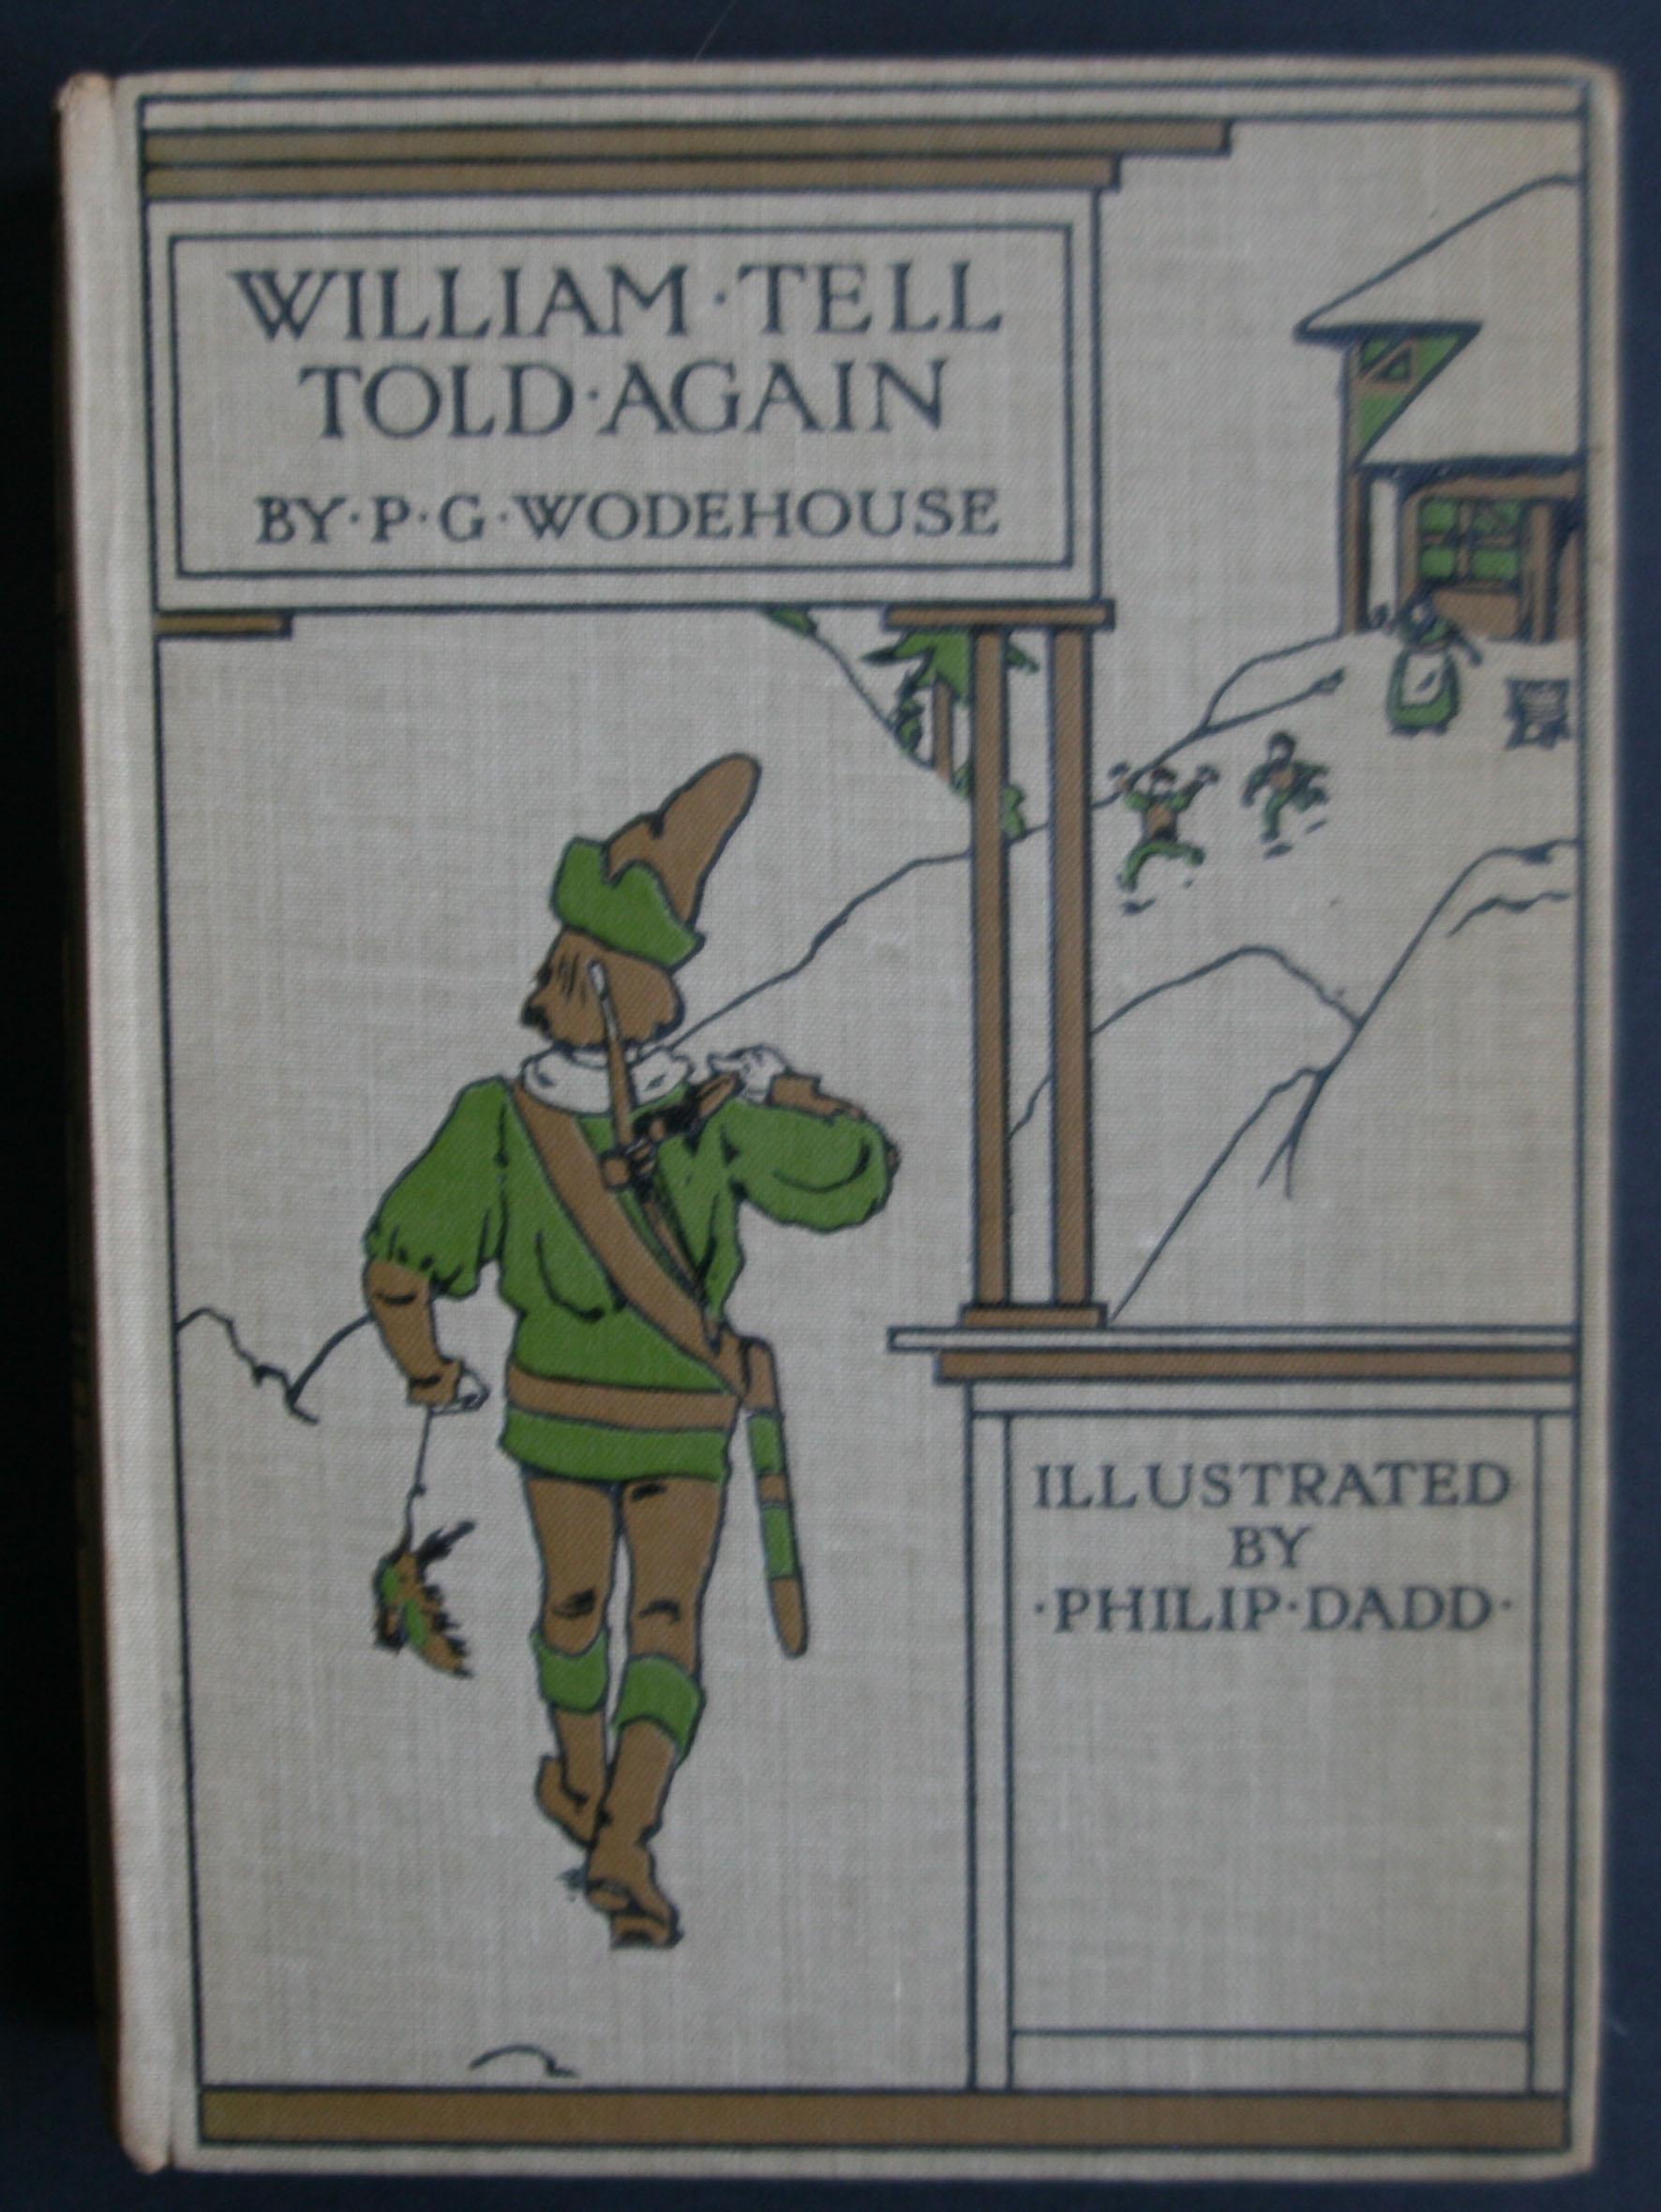 P G Wodehouse Wilhelm Tell told again